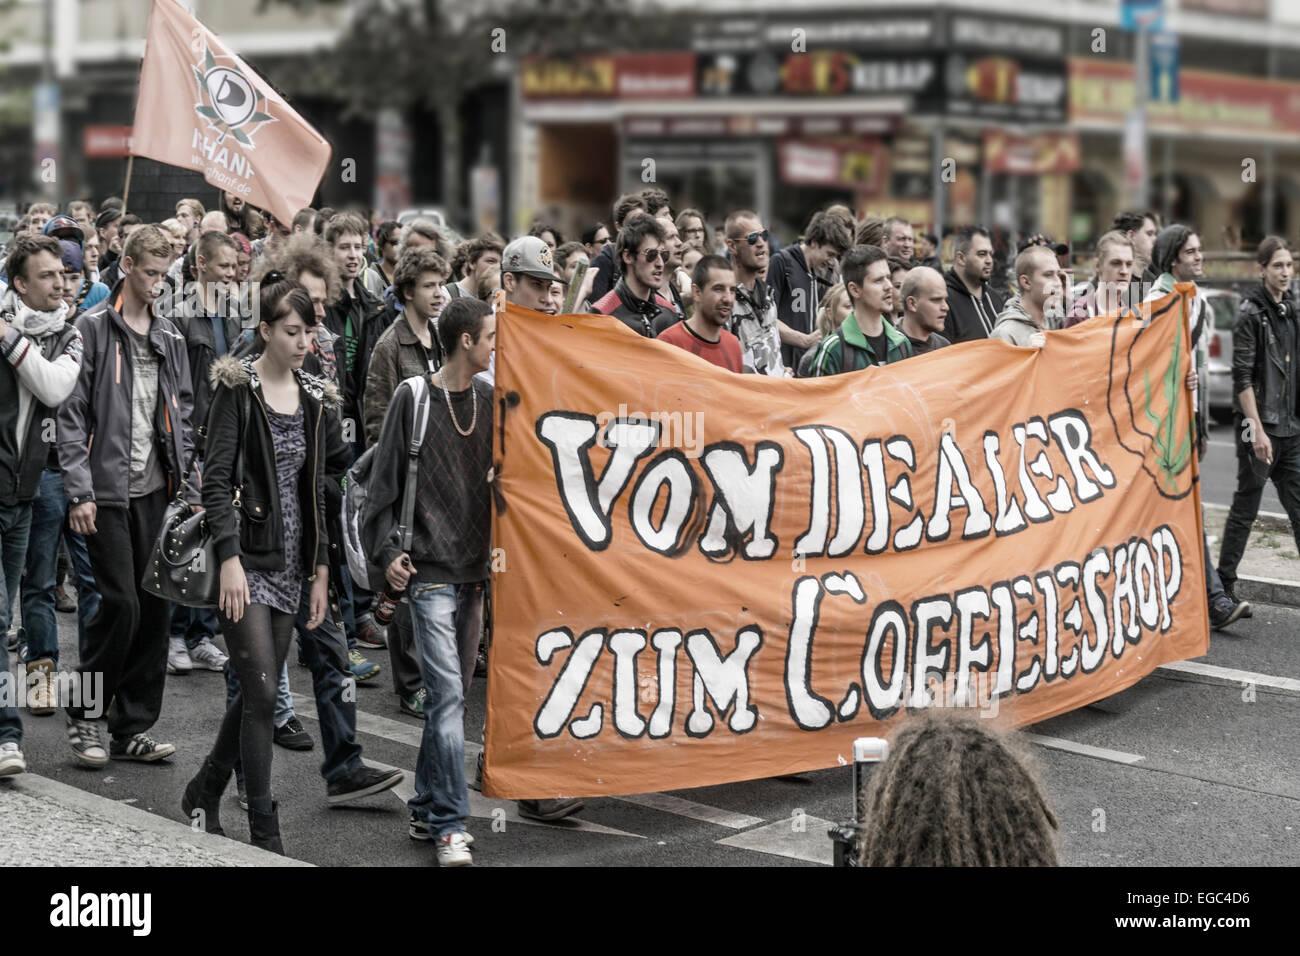 Demo in Kreuzberg for Legalizing Cannabis in Germany, Berlin - Stock Image